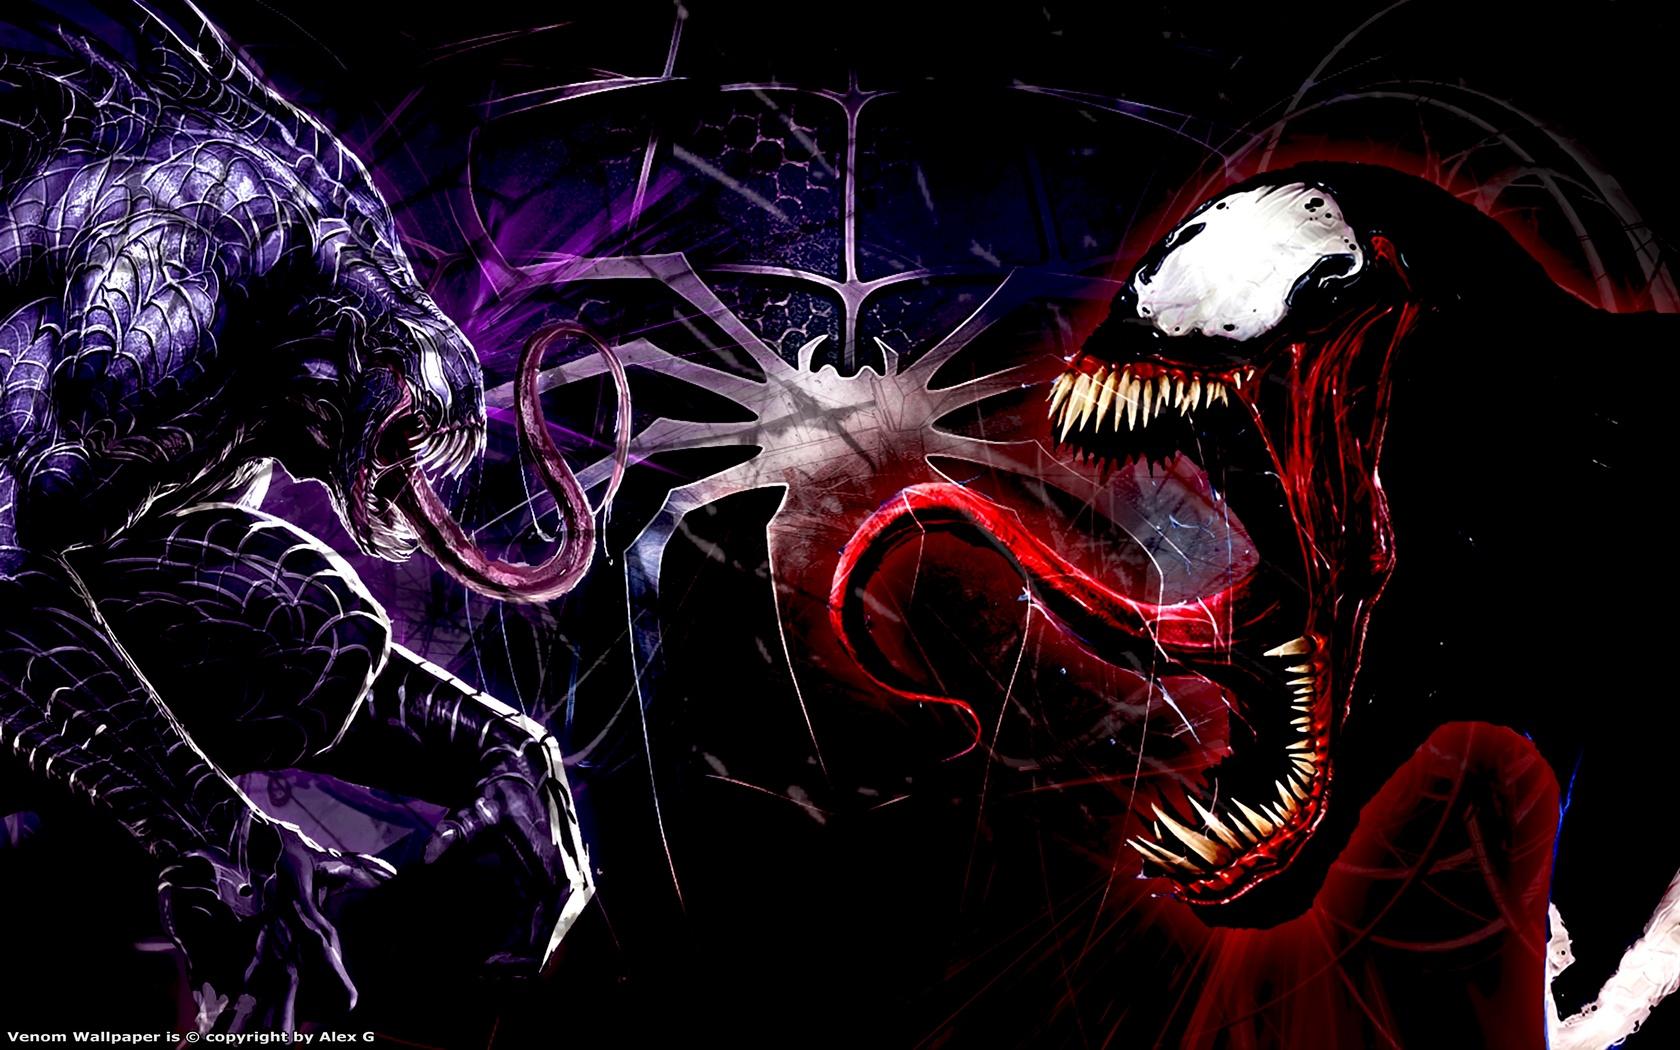 Venom Vs Carnage Wallpaper Hd HD Wallpapers on picsfaircom 1680x1050